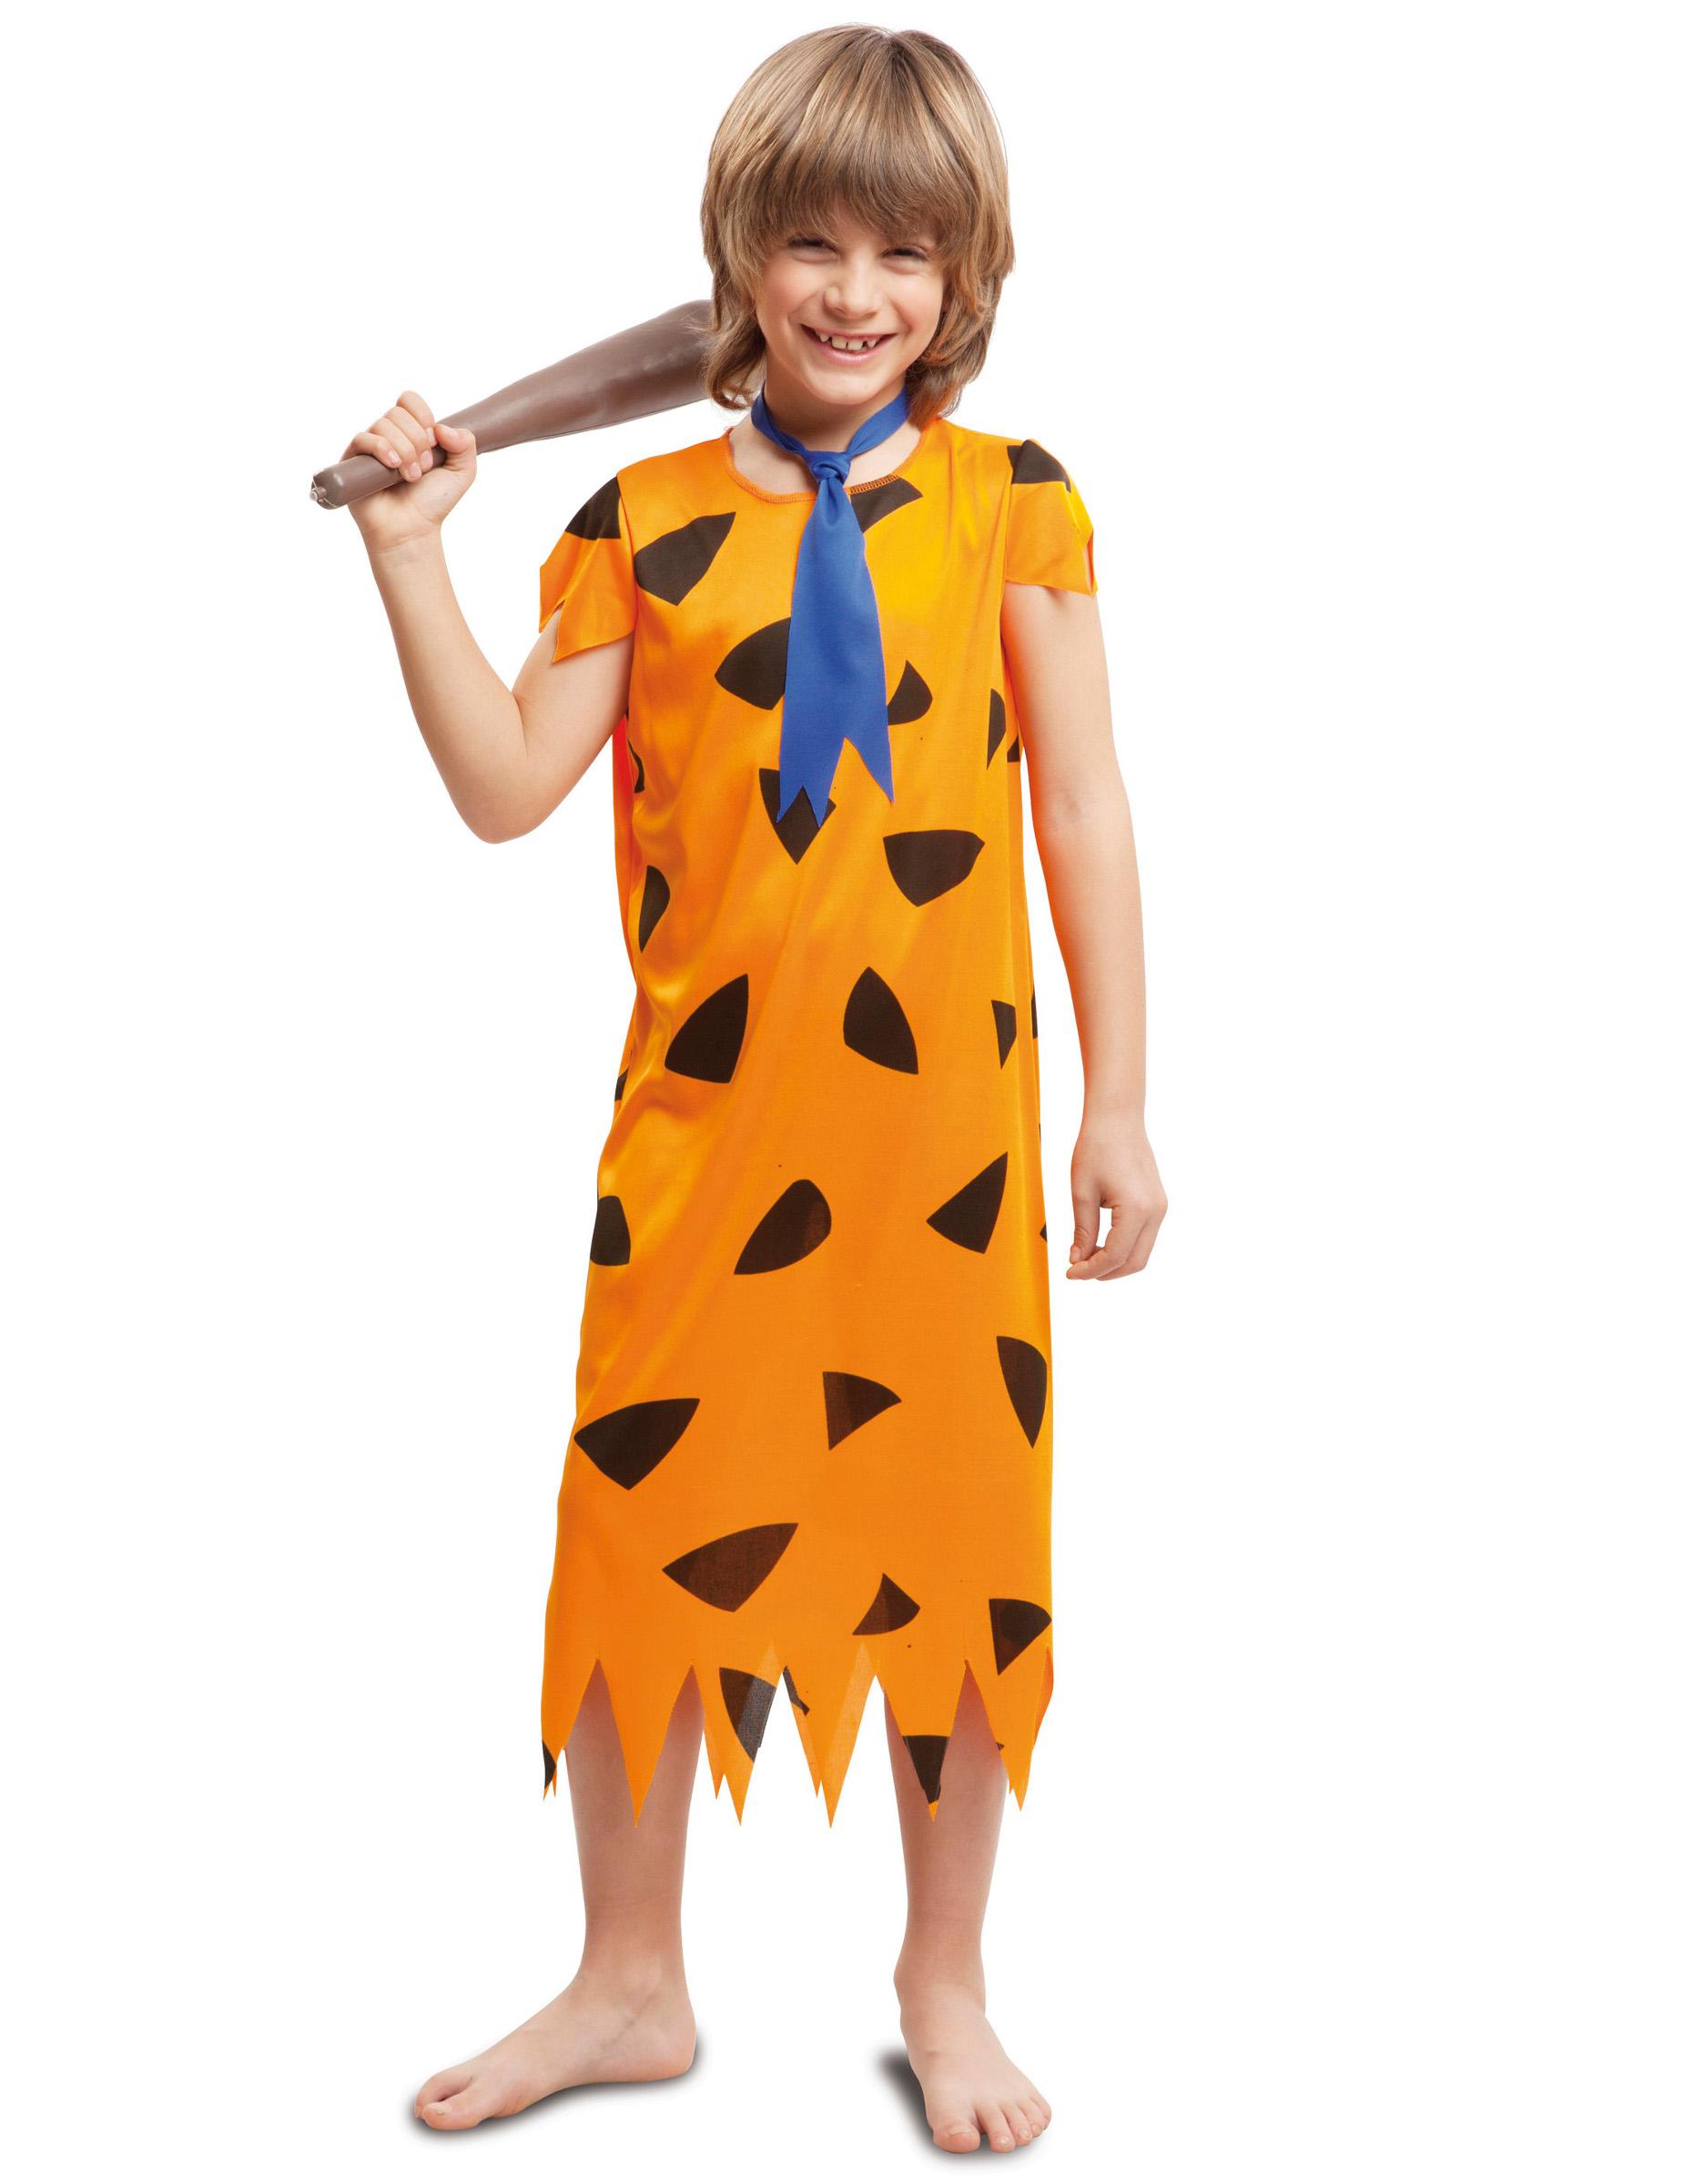 6deeed165 Disfarce pré-histórico cor de laranja menino  Disfarces Crianças ...